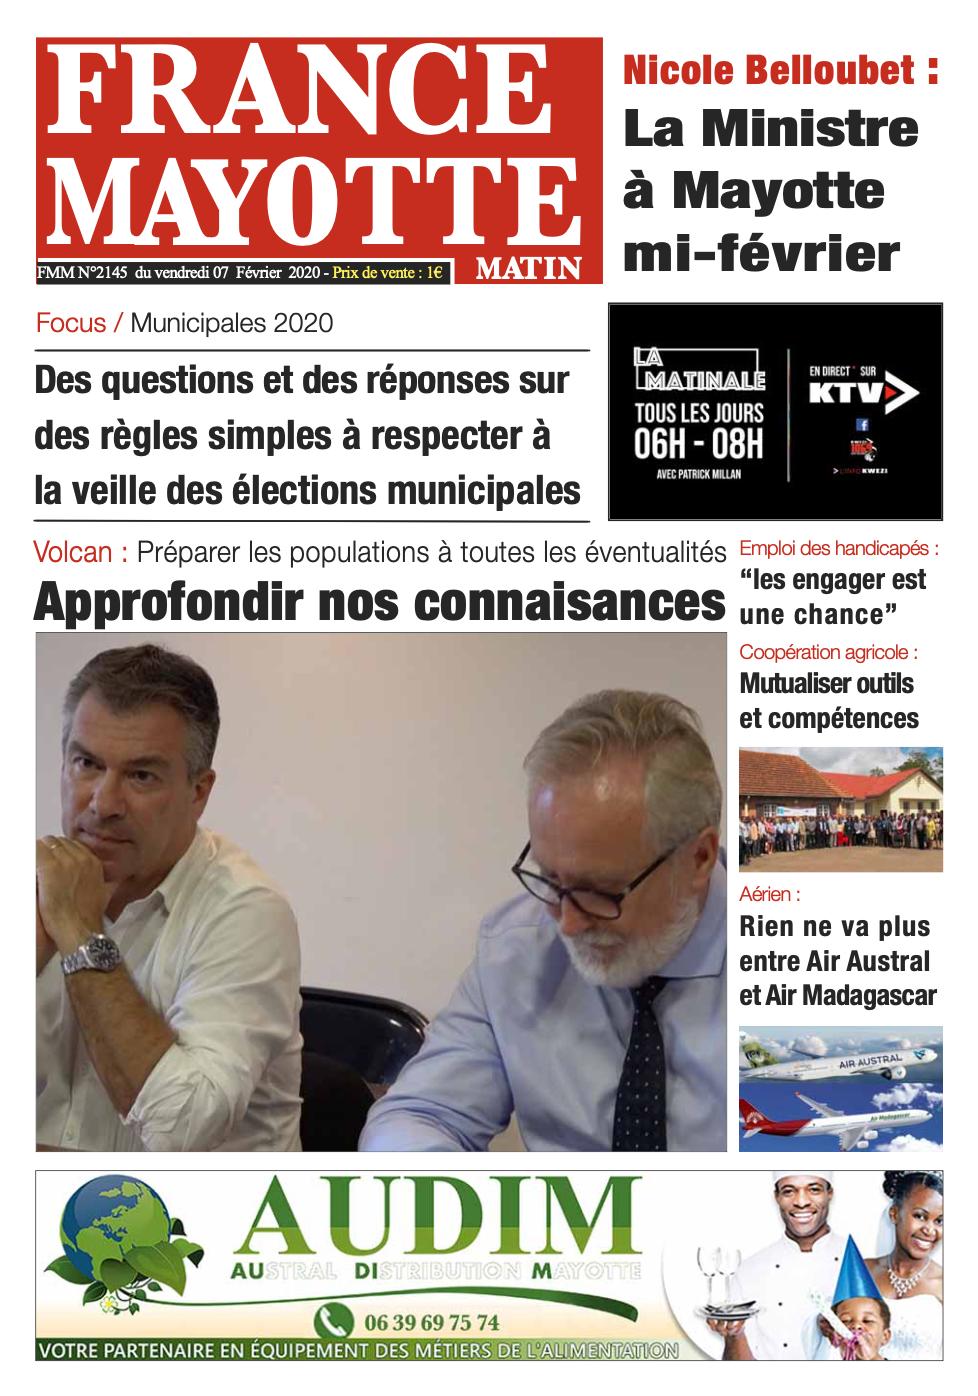 France Mayotte Vendredi 7 février 2020